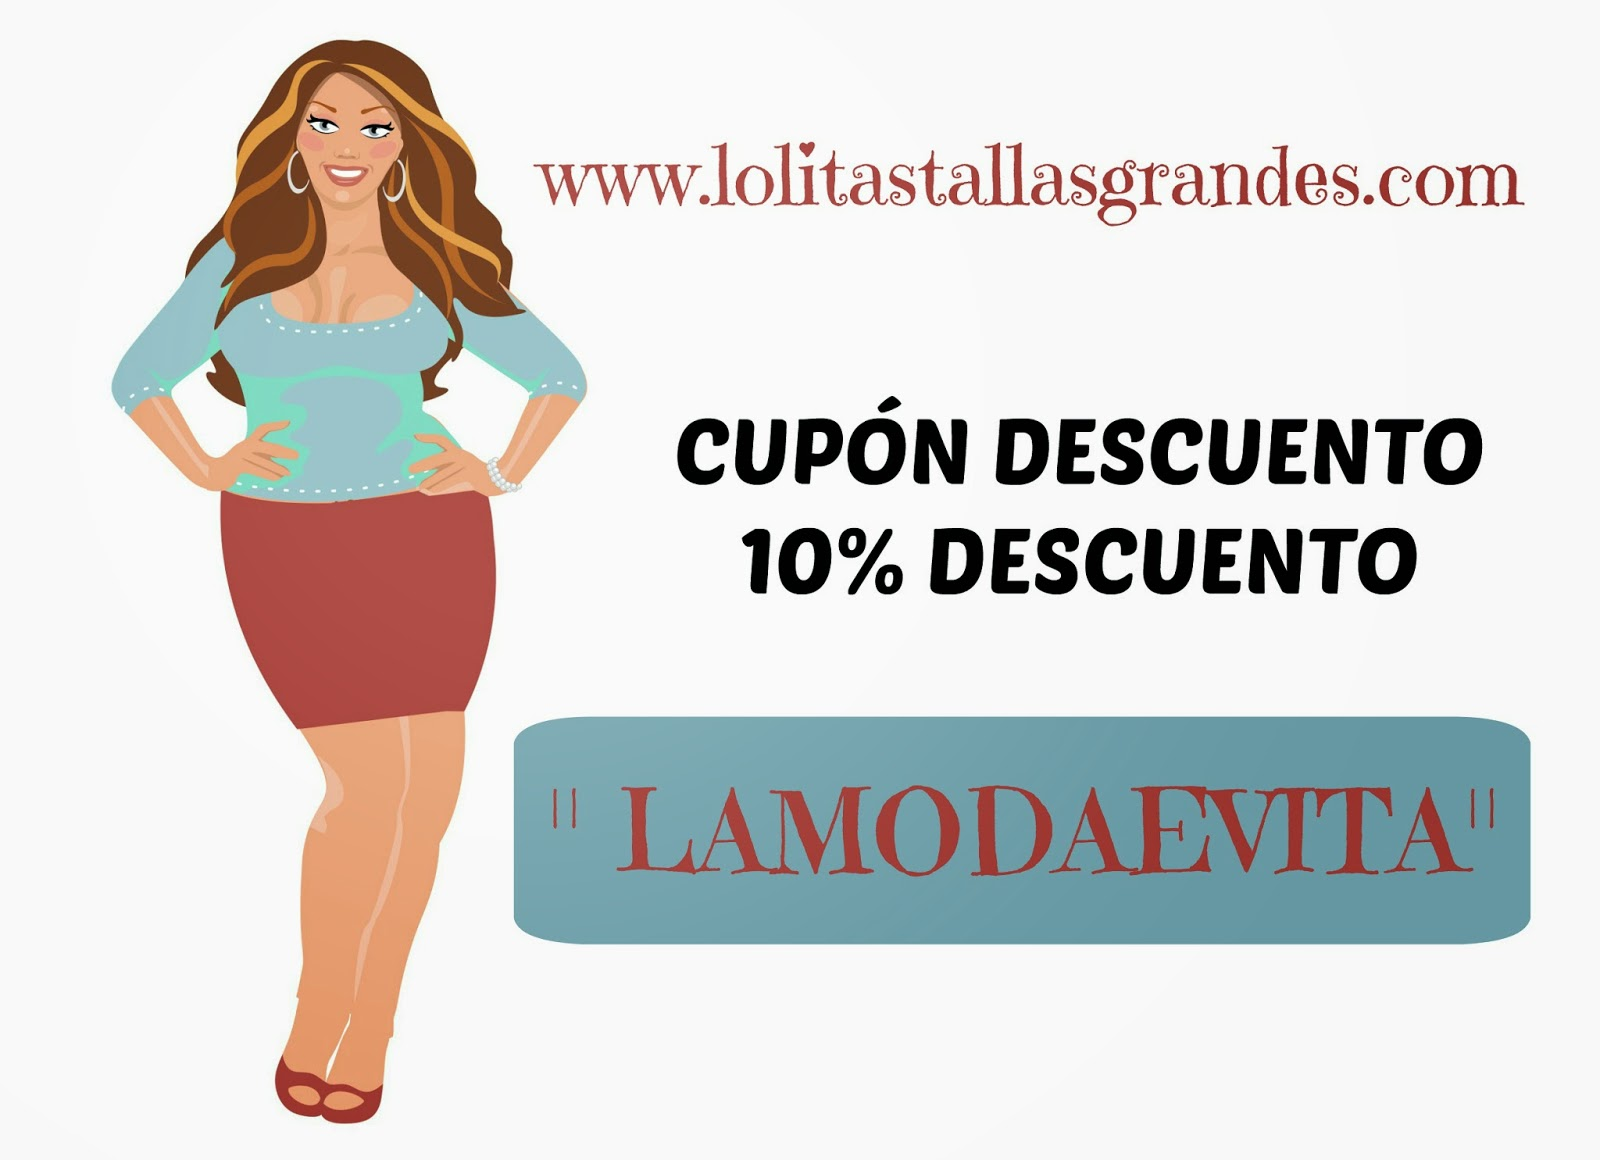 http://www.lolitastallasgrandes.com/